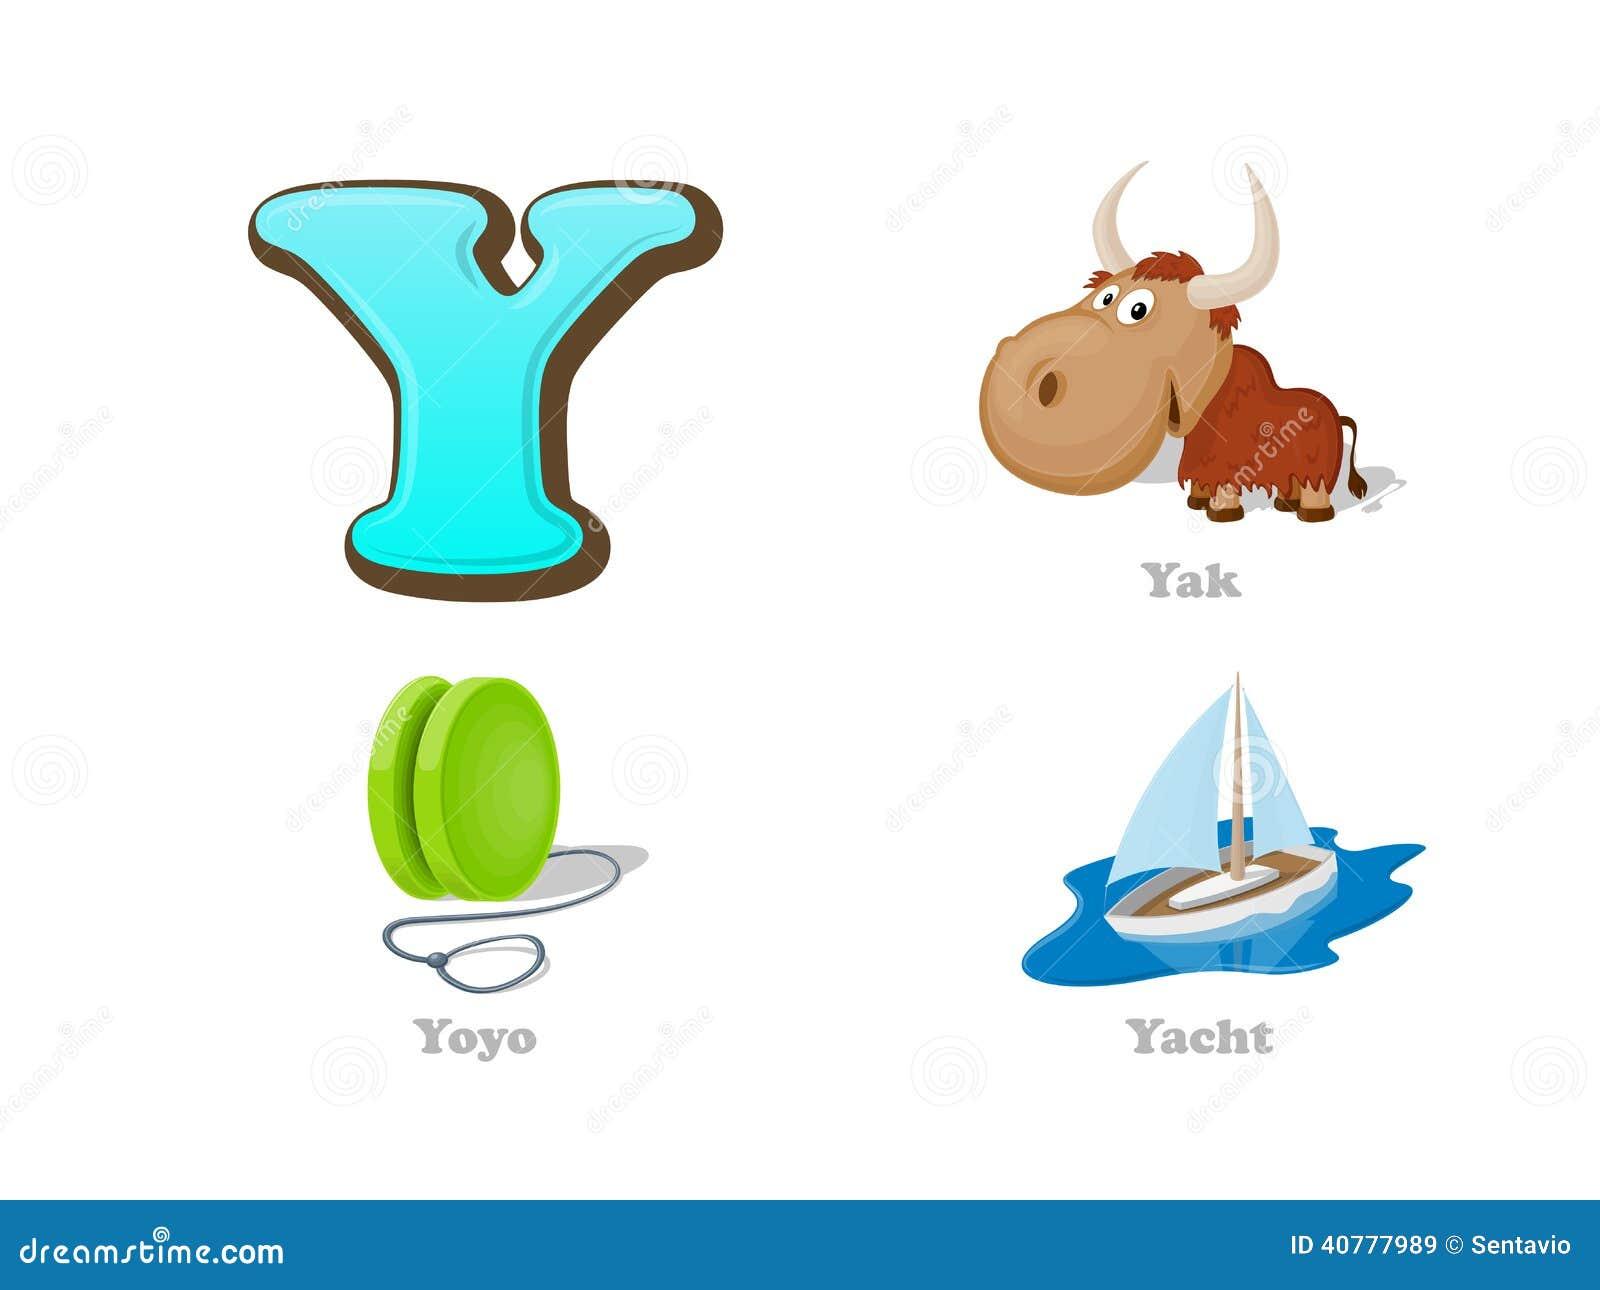 ABC Letter Y Funny Kid Icons Set: Yak, Yo-yo, Yacht Stock Vector ...